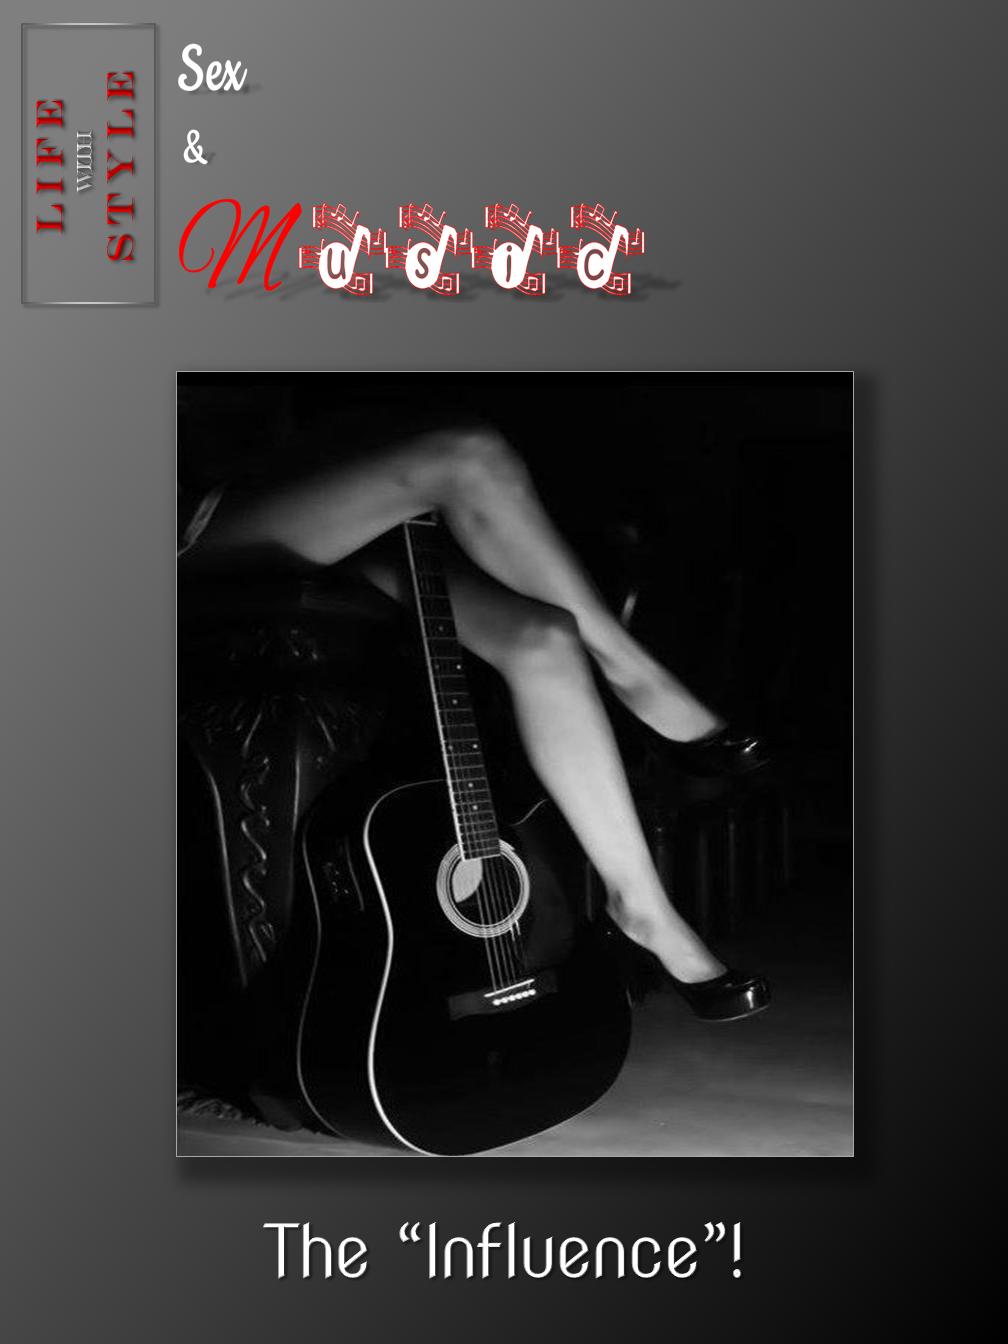 Sex & Music